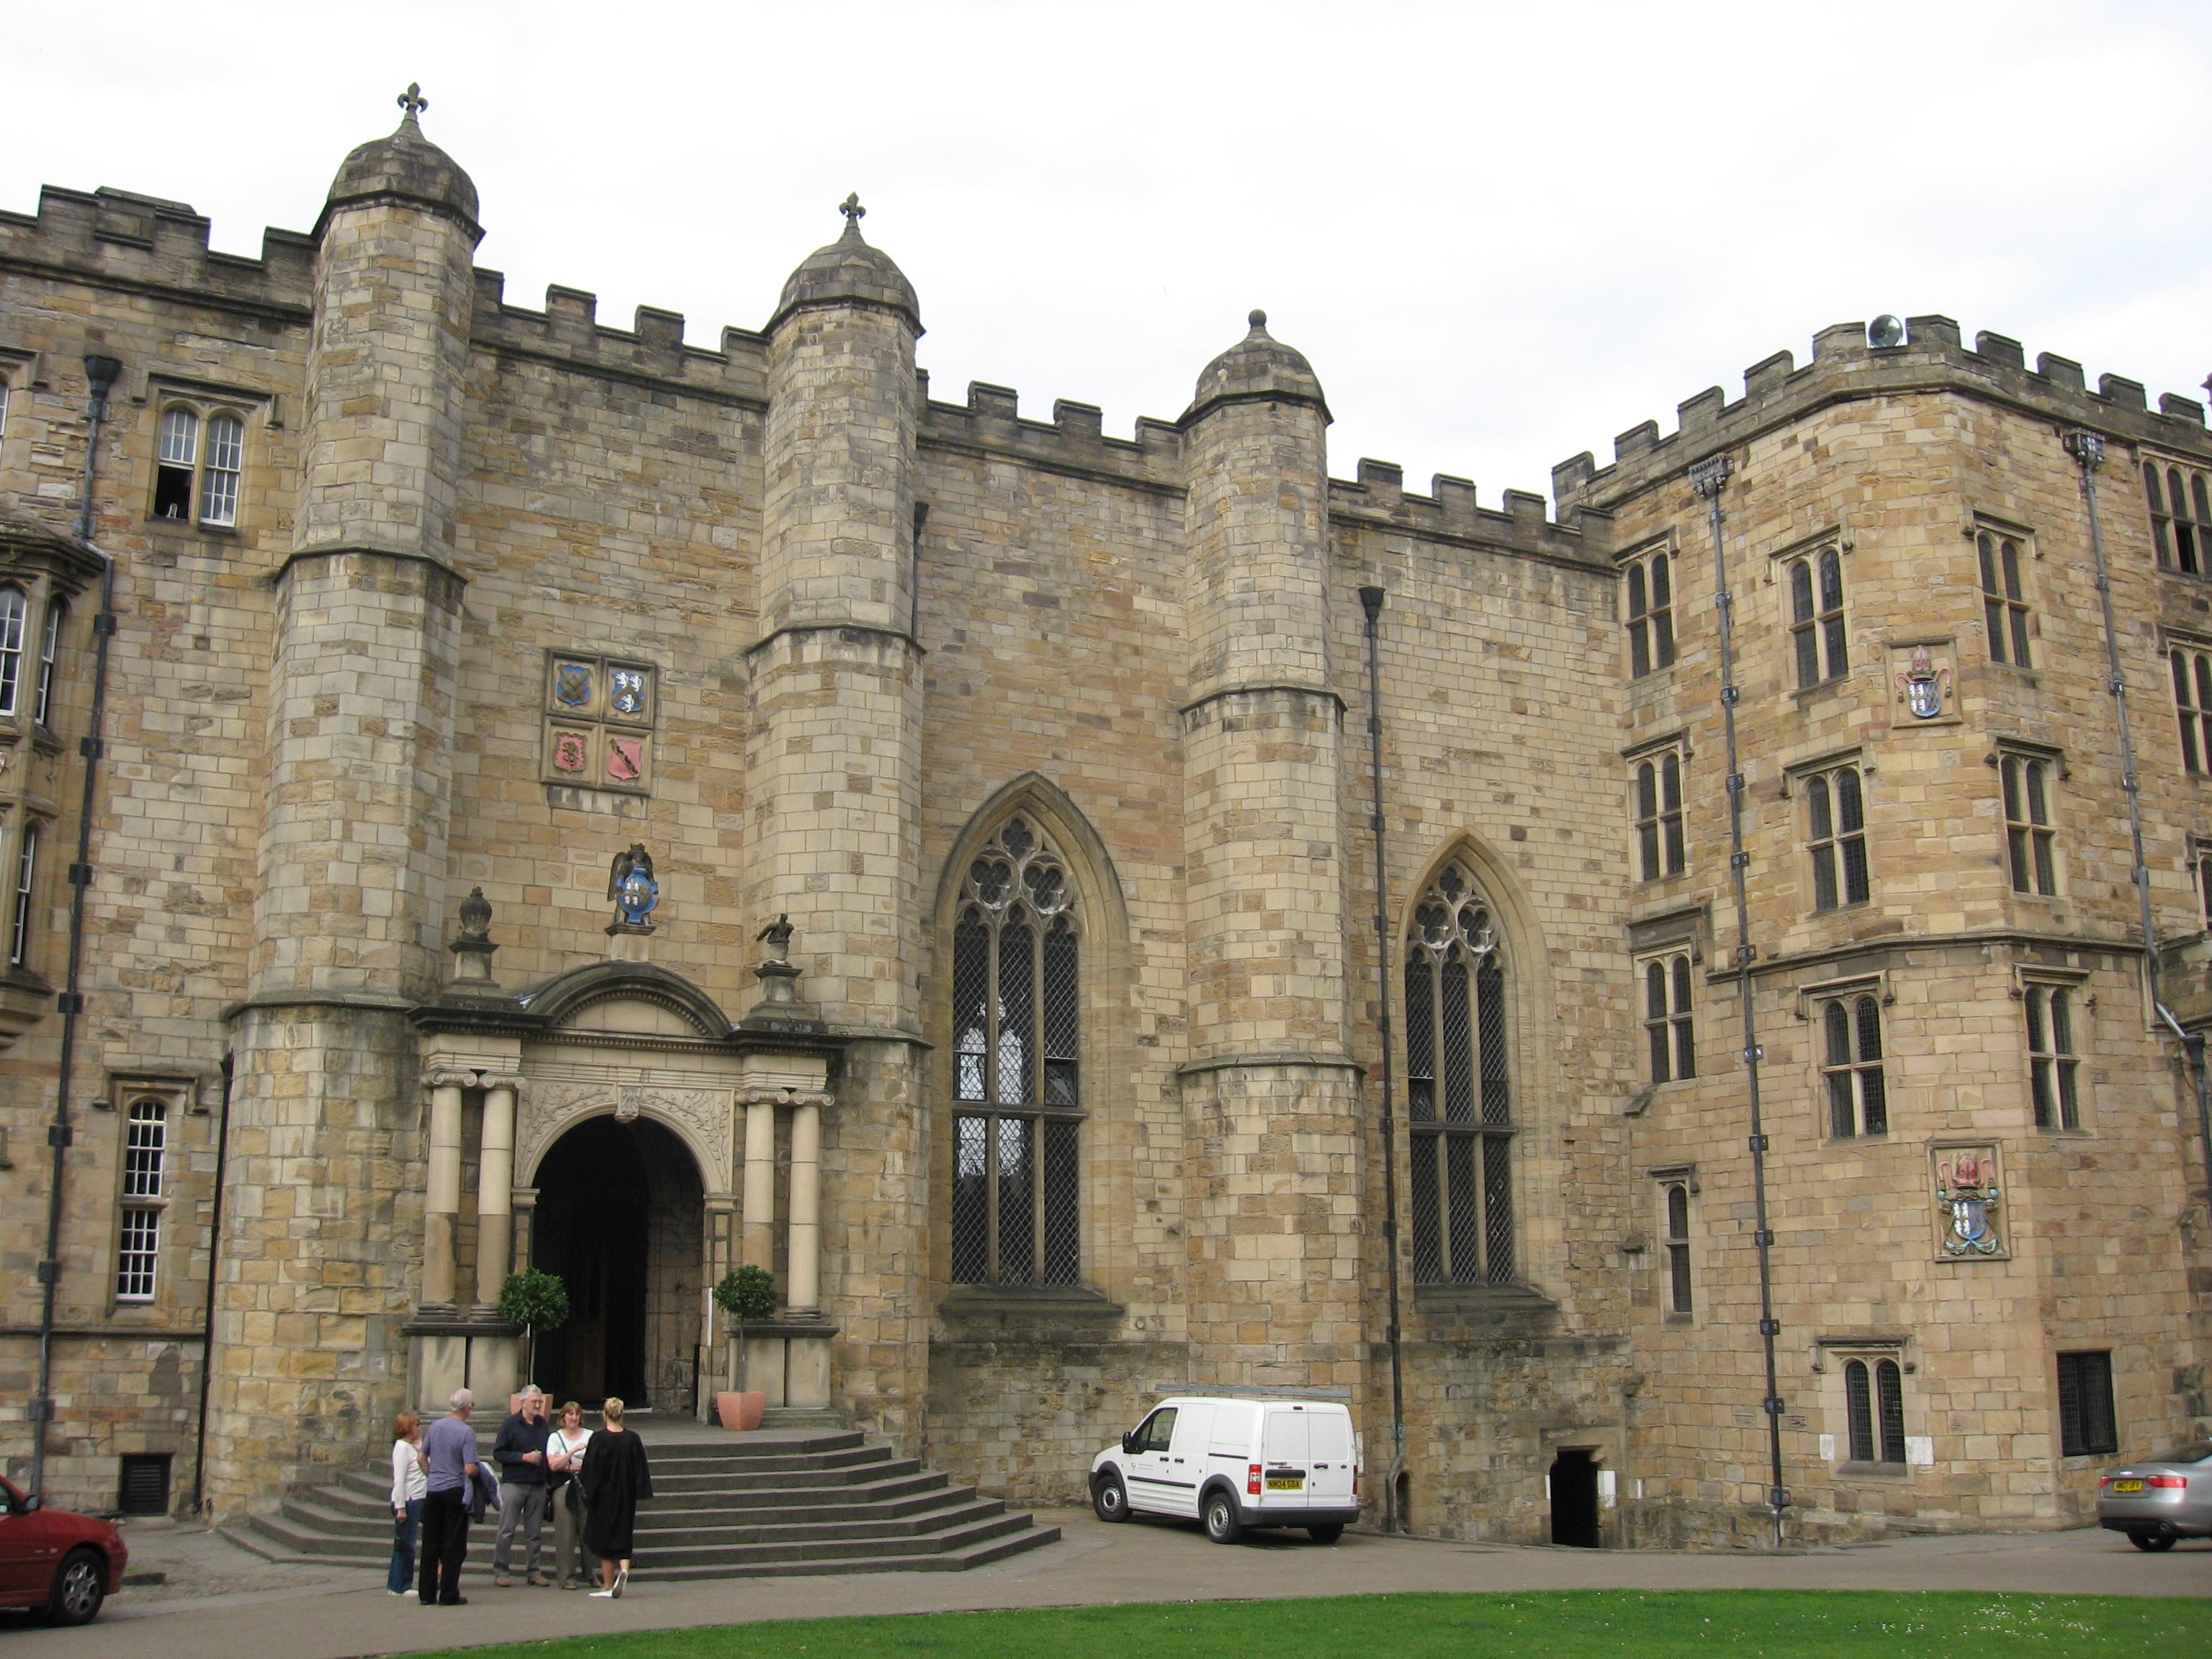 https://i2.wp.com/upload.wikimedia.org/wikipedia/commons/0/0d/Durham_Castle_Entrance.JPG